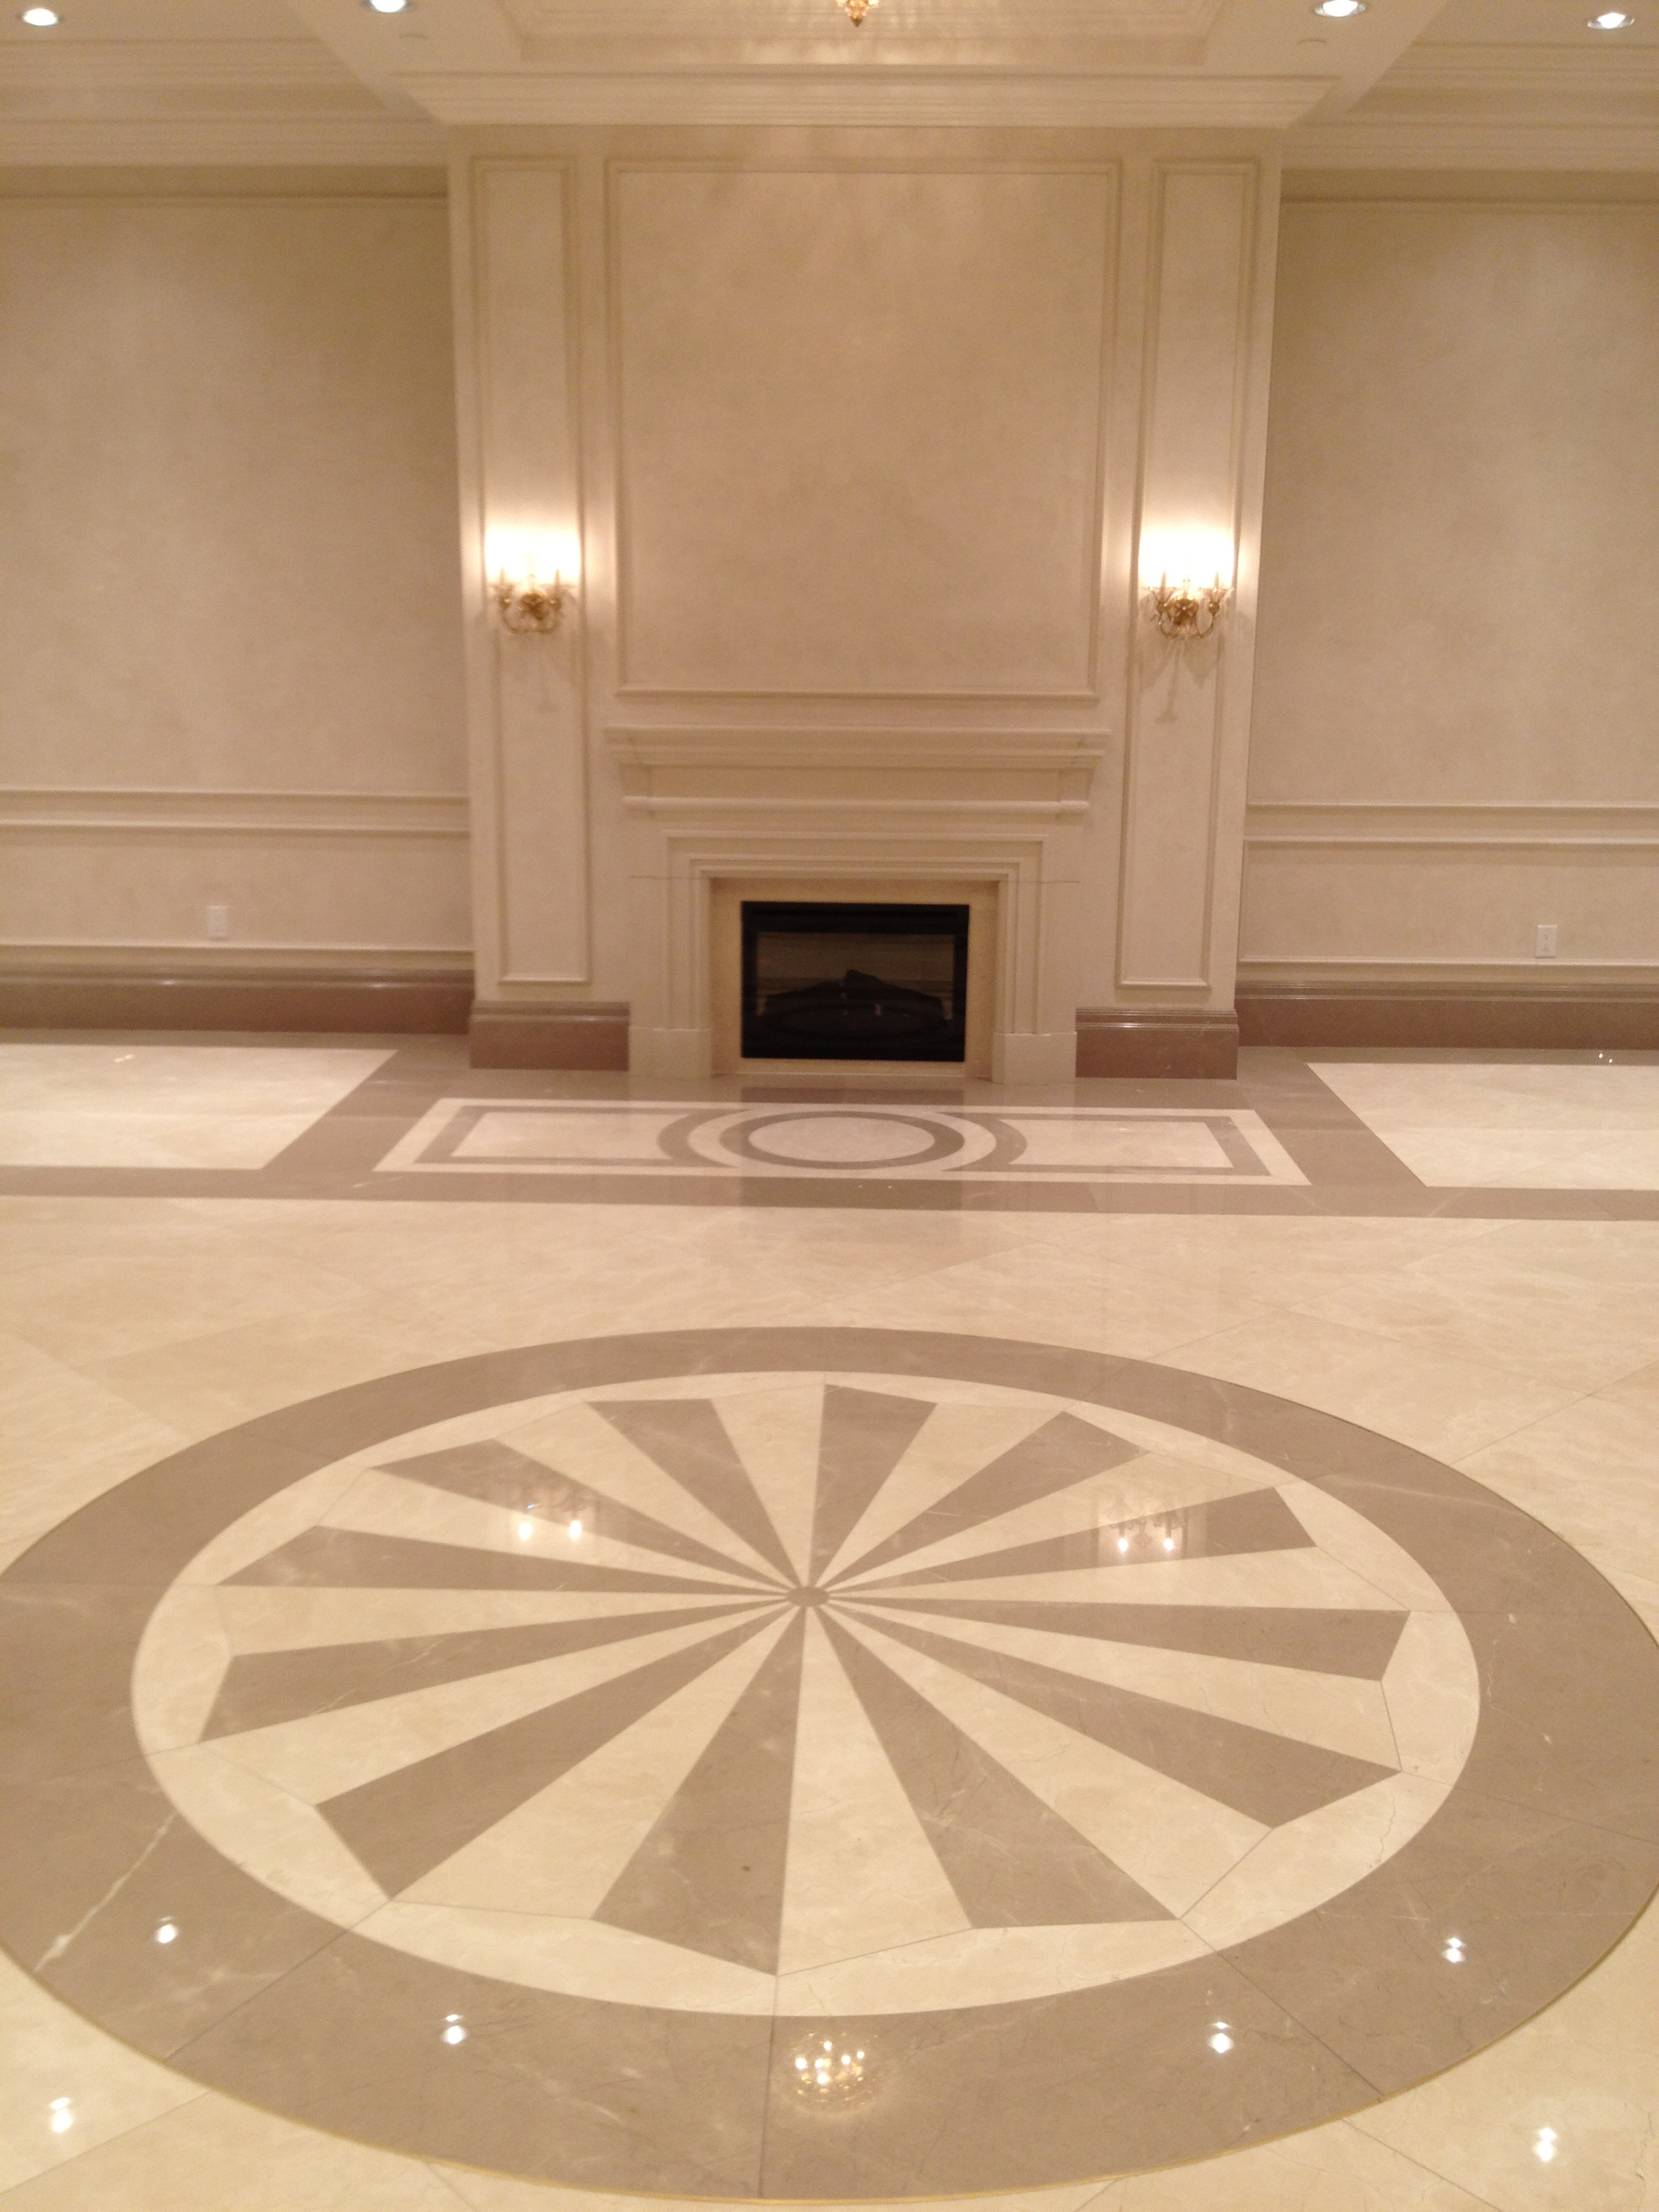 We specialize in custom tile work